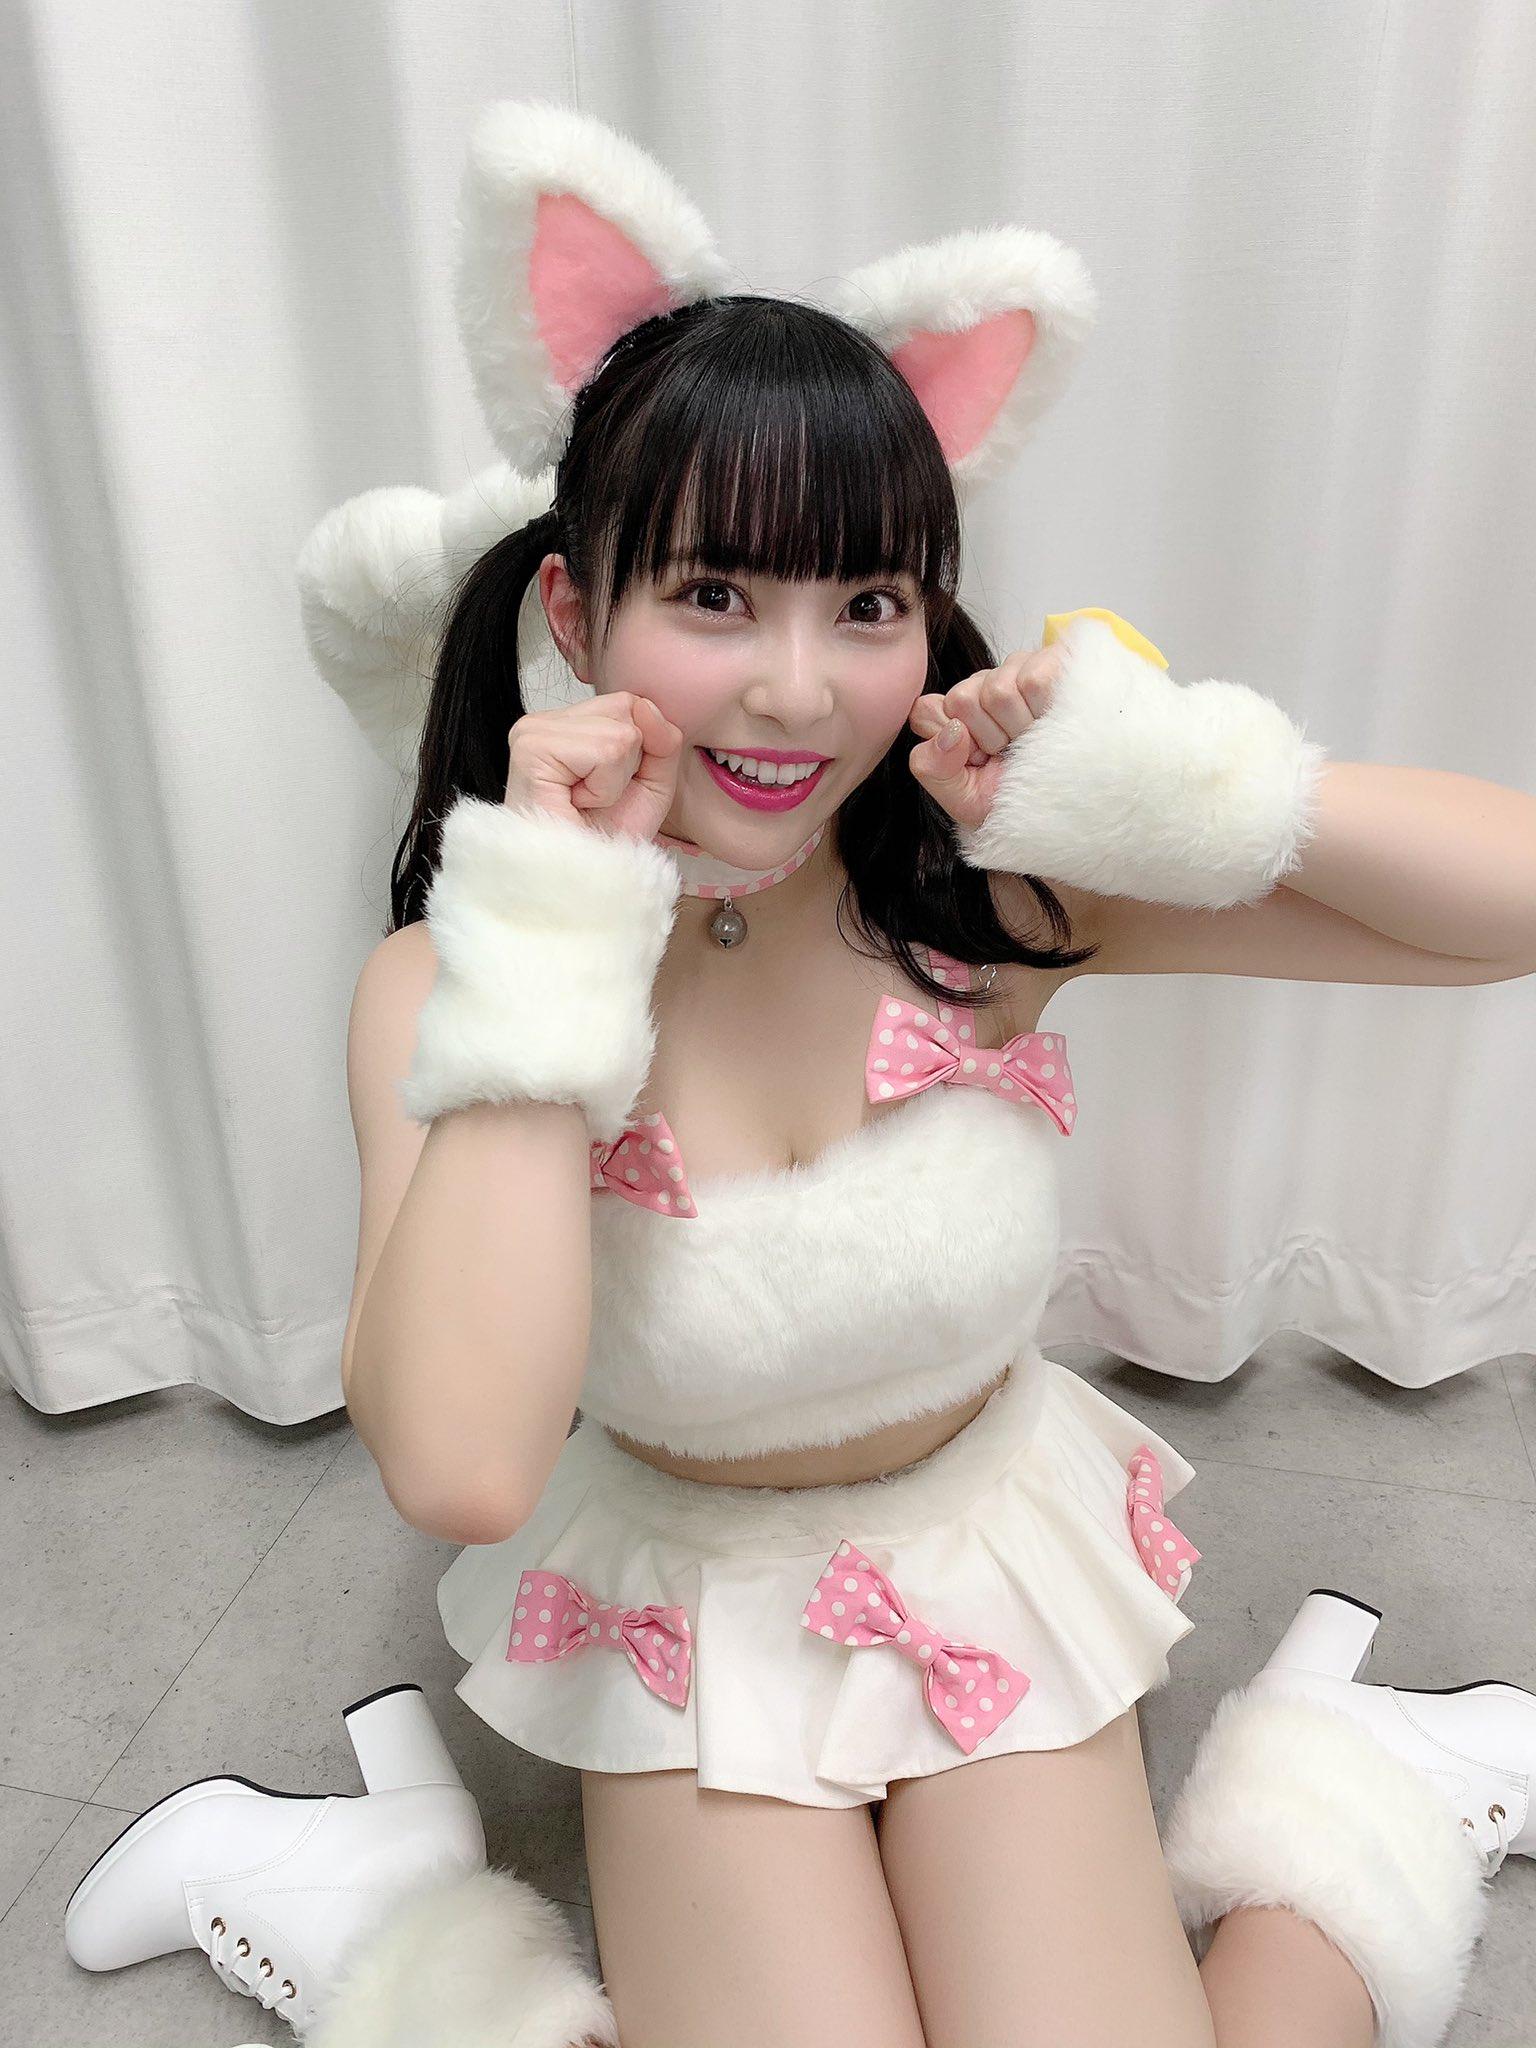 NMB48堀詩音「飼わせてください…」猫の日にセクシーな猫耳衣装を公開【画像4枚】の画像004